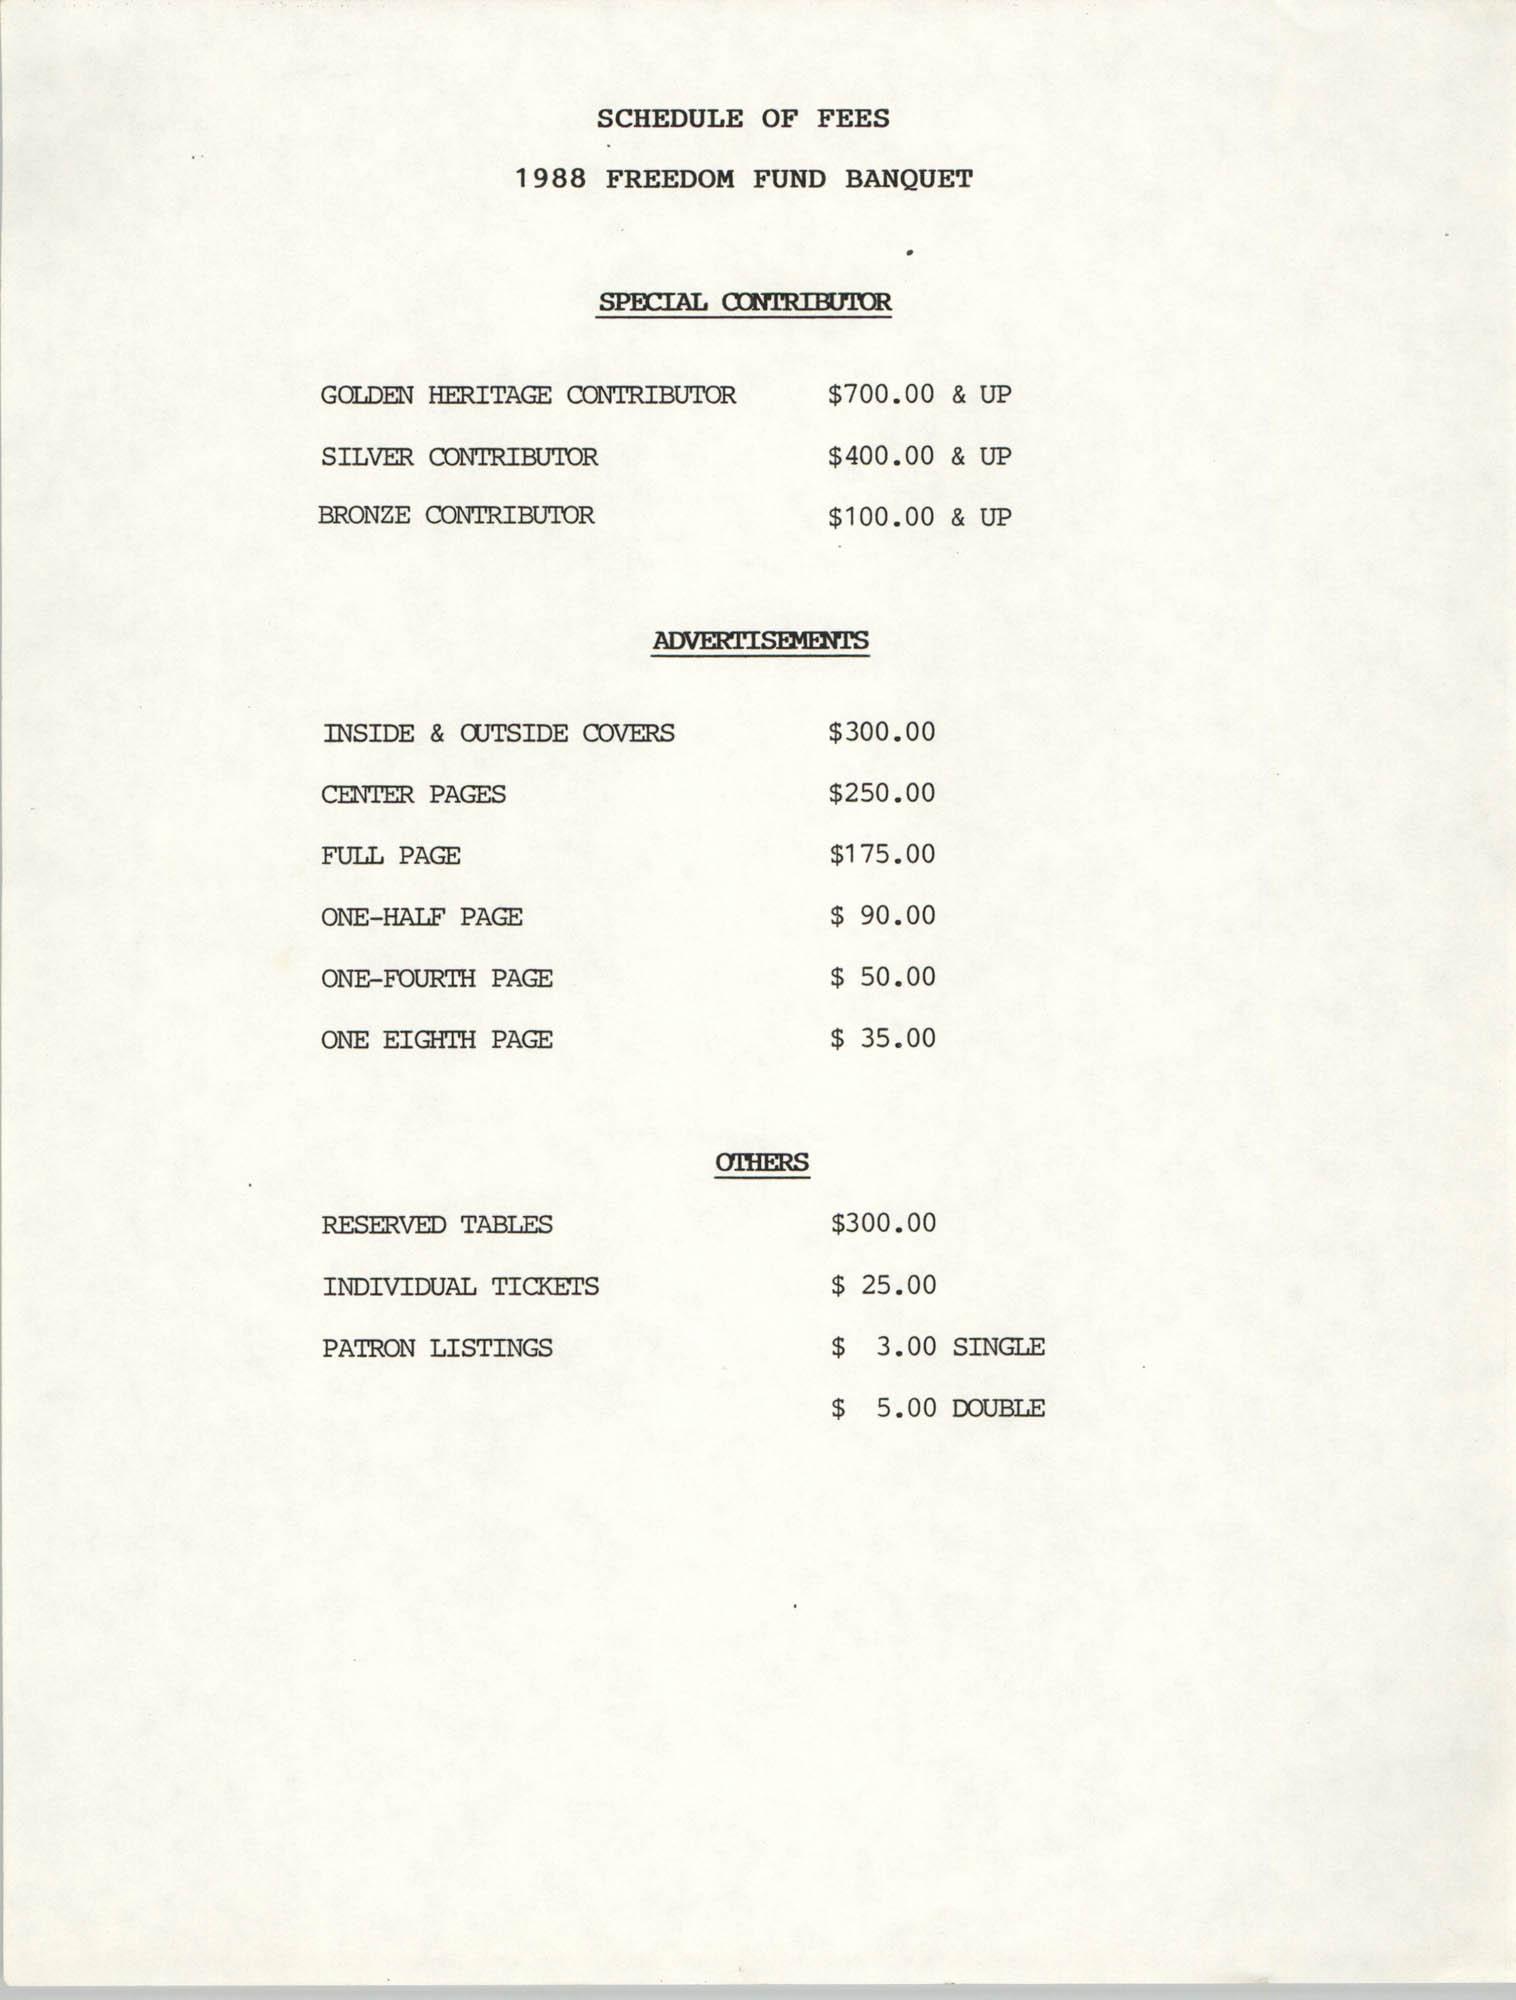 Schedule of Fees, 1988 Freedom Fund Banquet